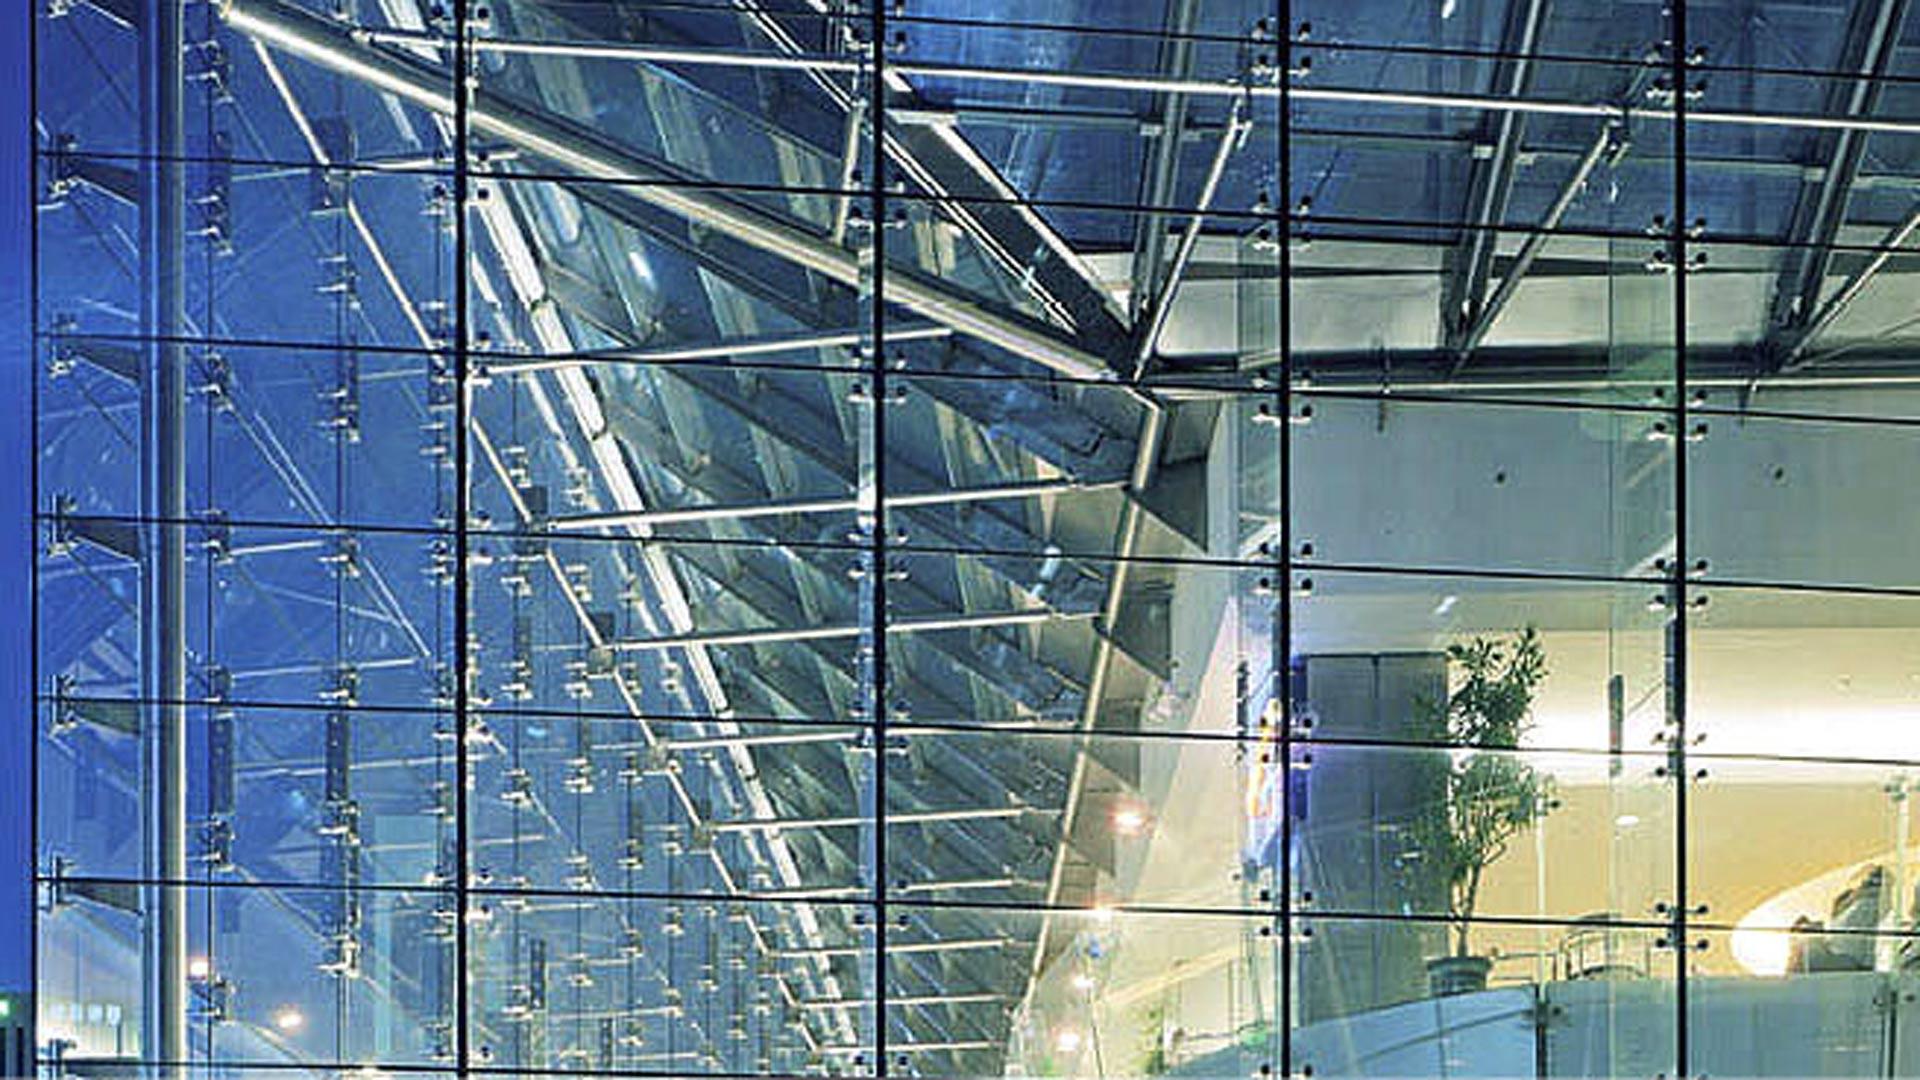 structural glazing, structural glass, structural glass wall, laminated glass windows